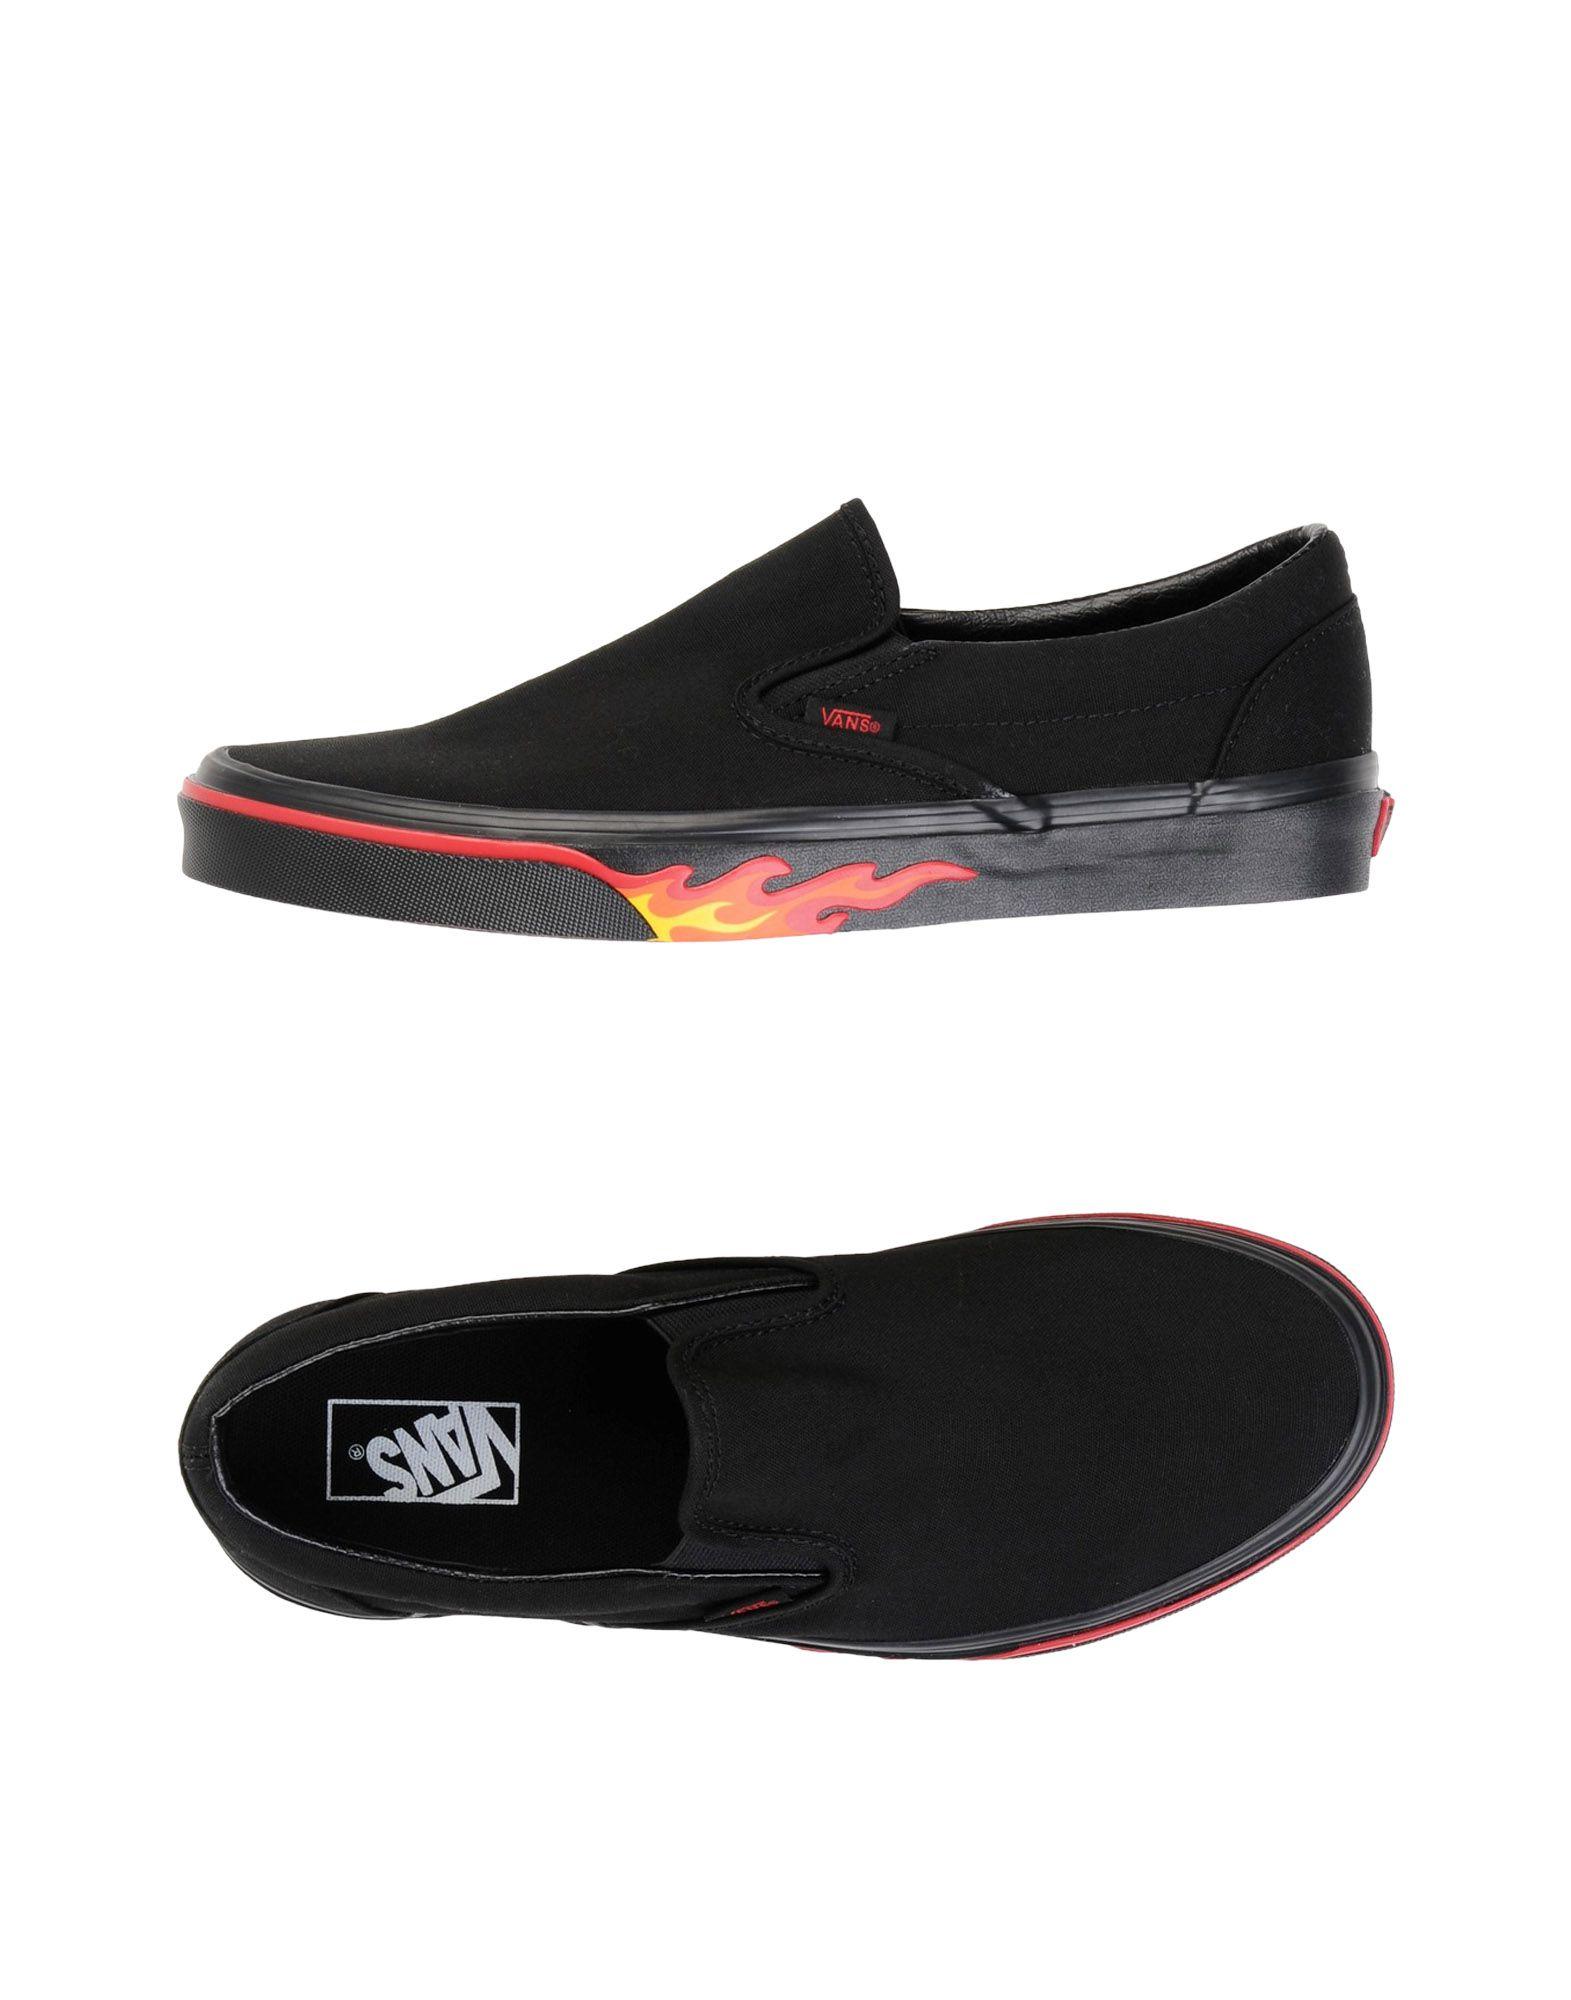 Sneakers Vans Ua Classic Slip-On - Homme - Sneakers Vans  Noir Mode pas cher et belle